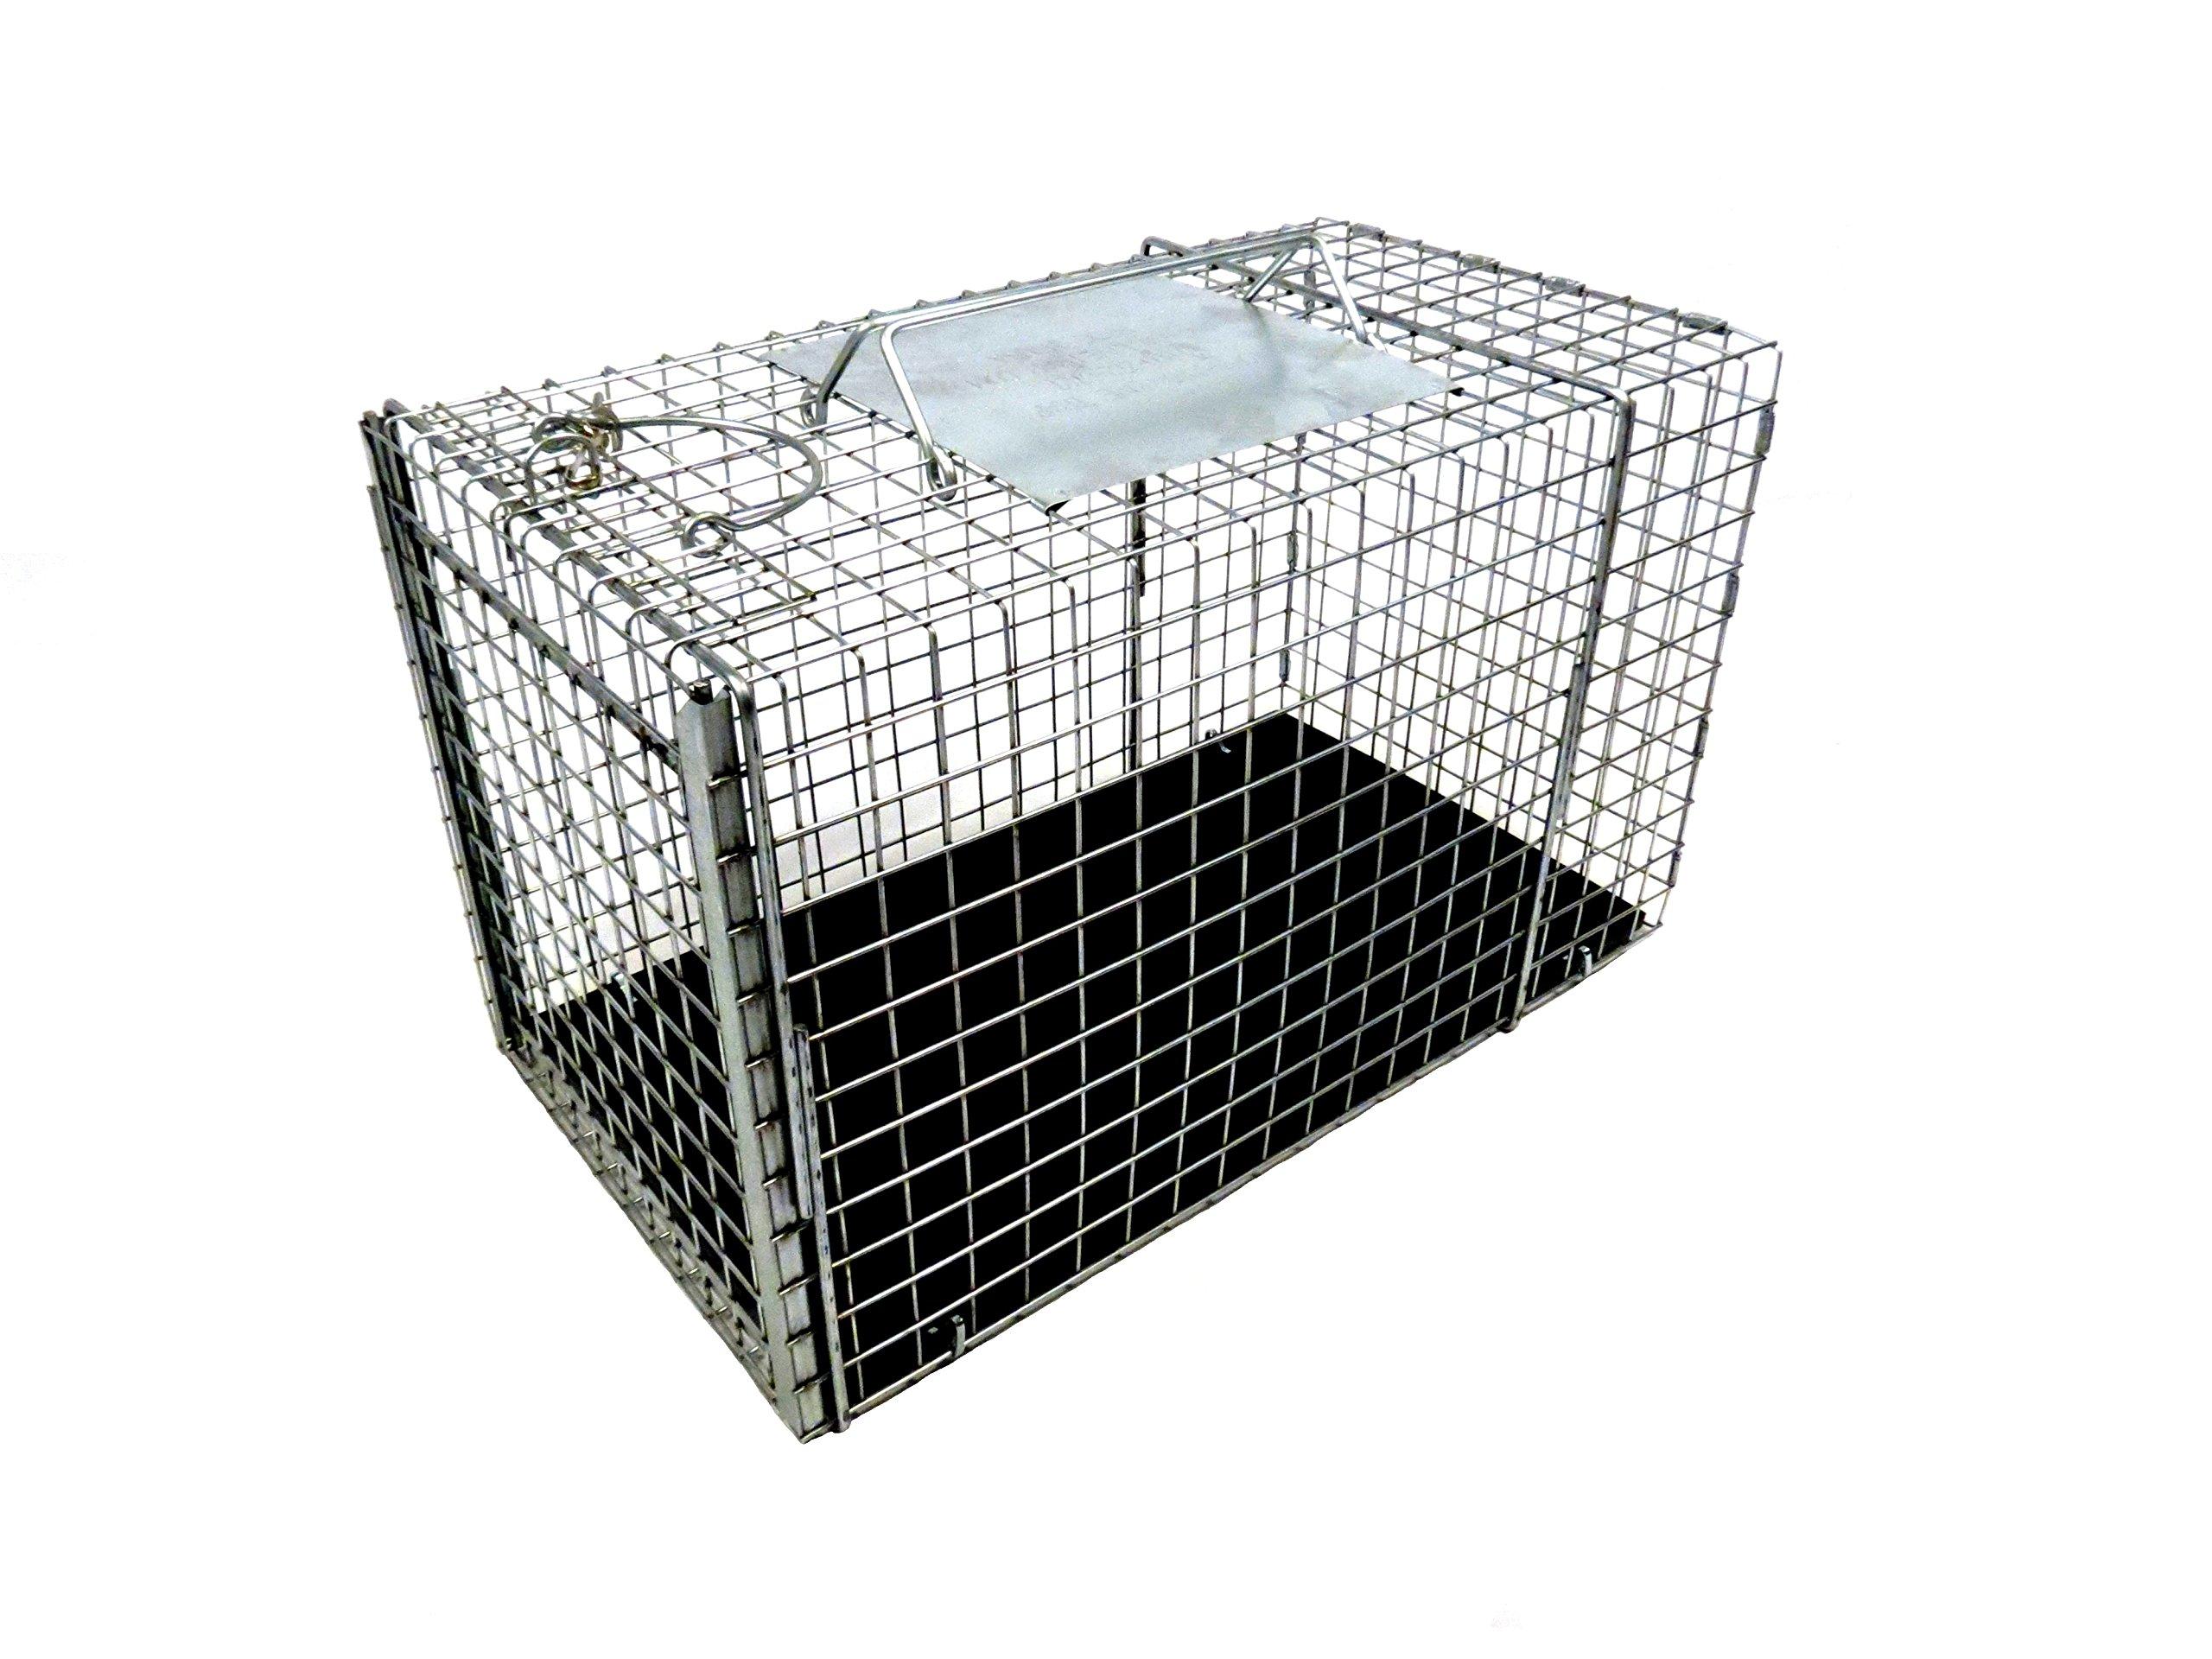 Tomahawk Neighborhood Cat Transfer Cage for Neighborhood Cat Trap